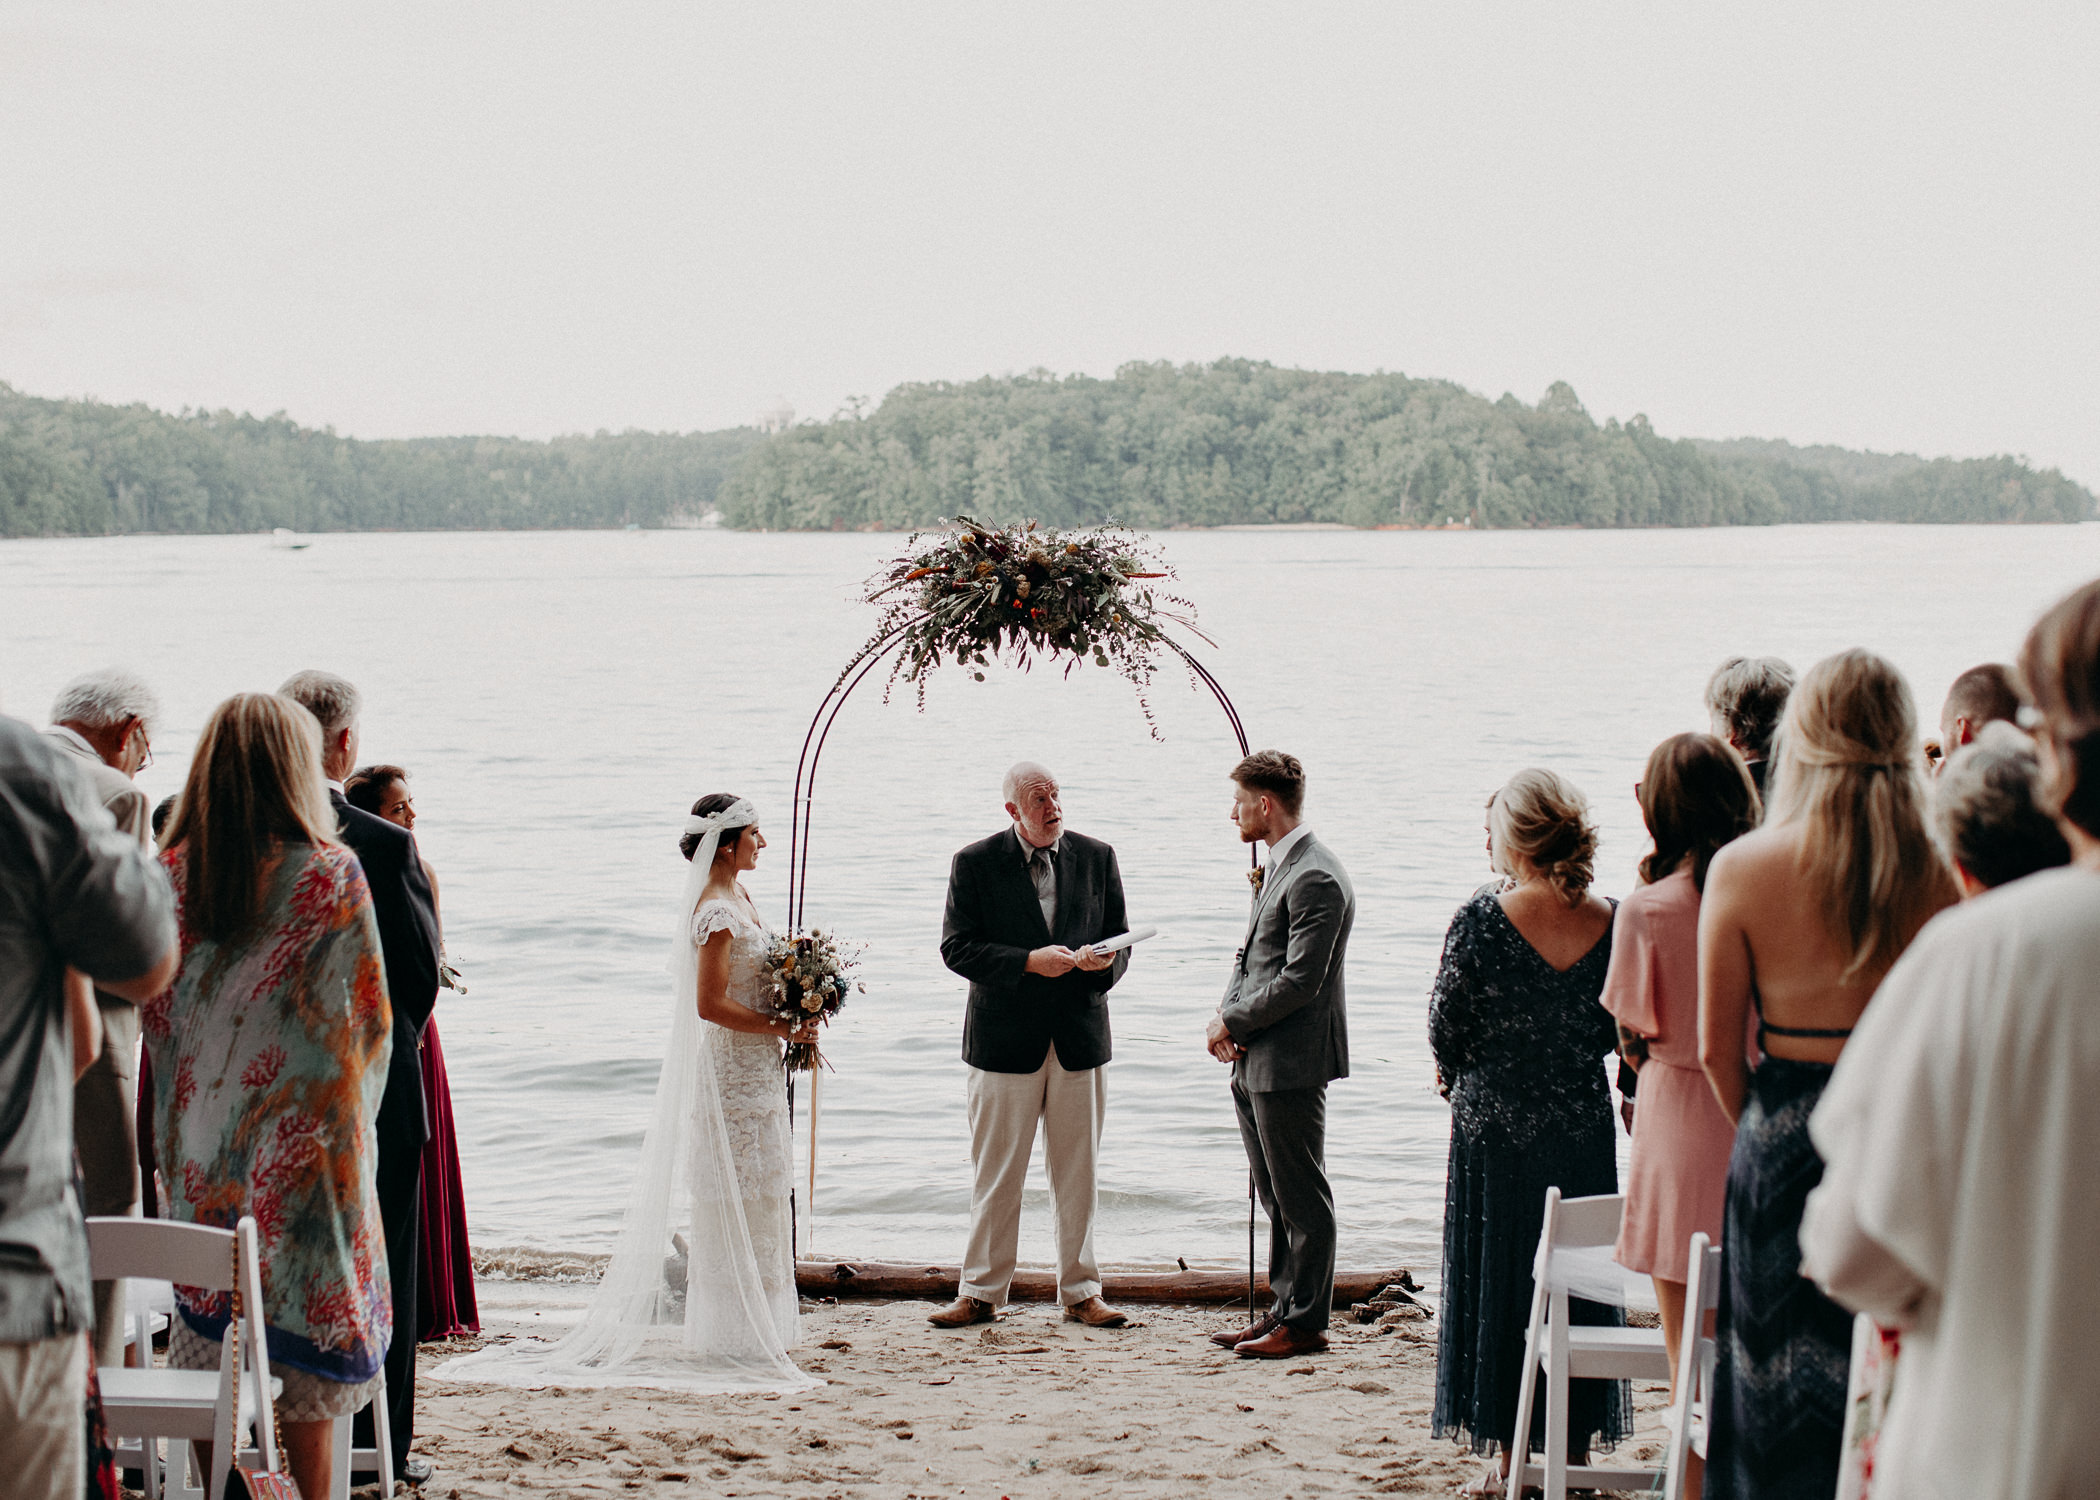 98 - Bride walking down the aisle -  Wedding Ceremony - Destination Wedding : Beach : Lake Wedding Atlanta Wedding Photographer .jpg